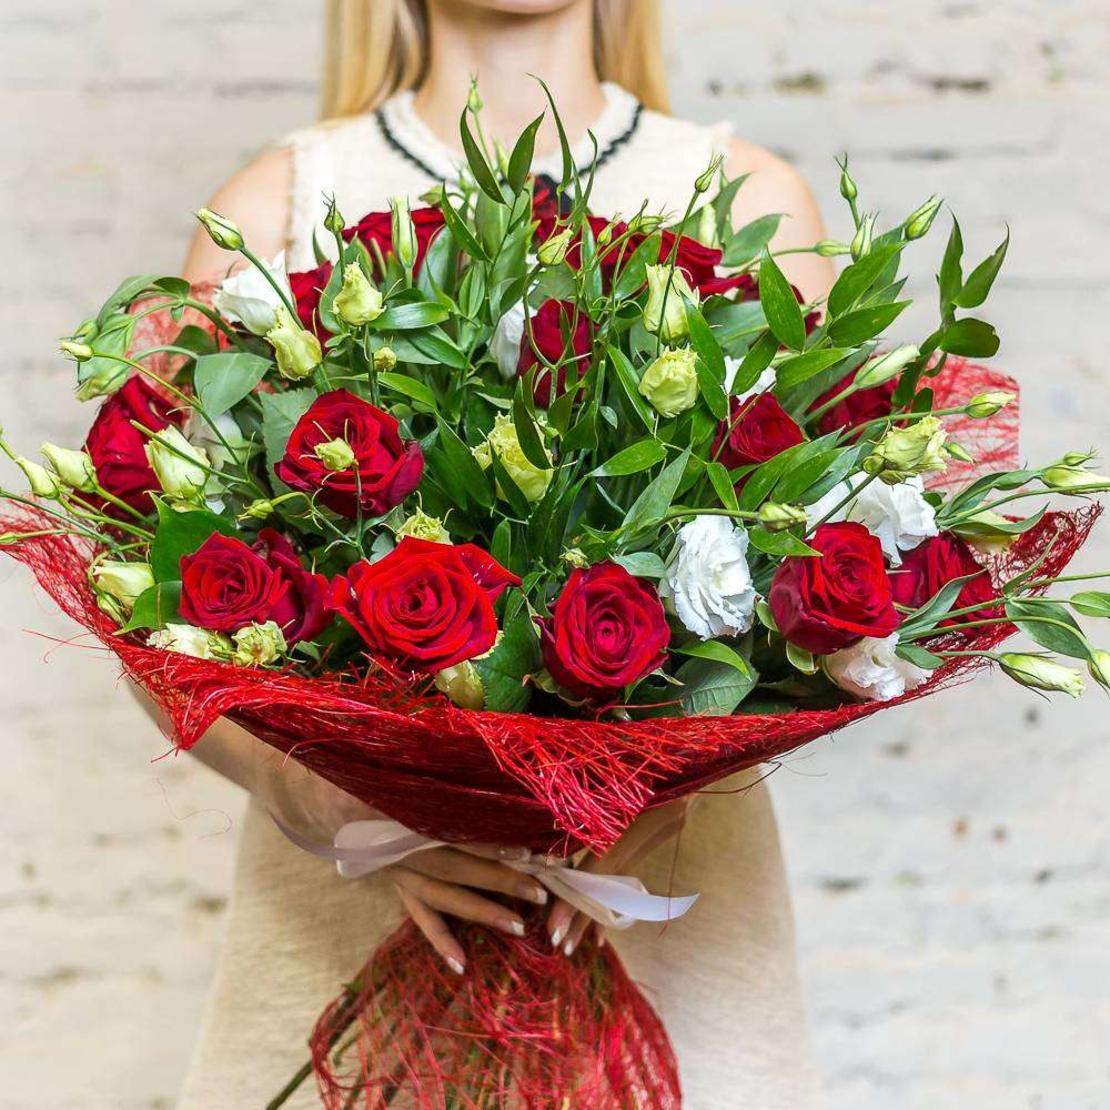 זר ליזיאנטוס ורדים אדומים -